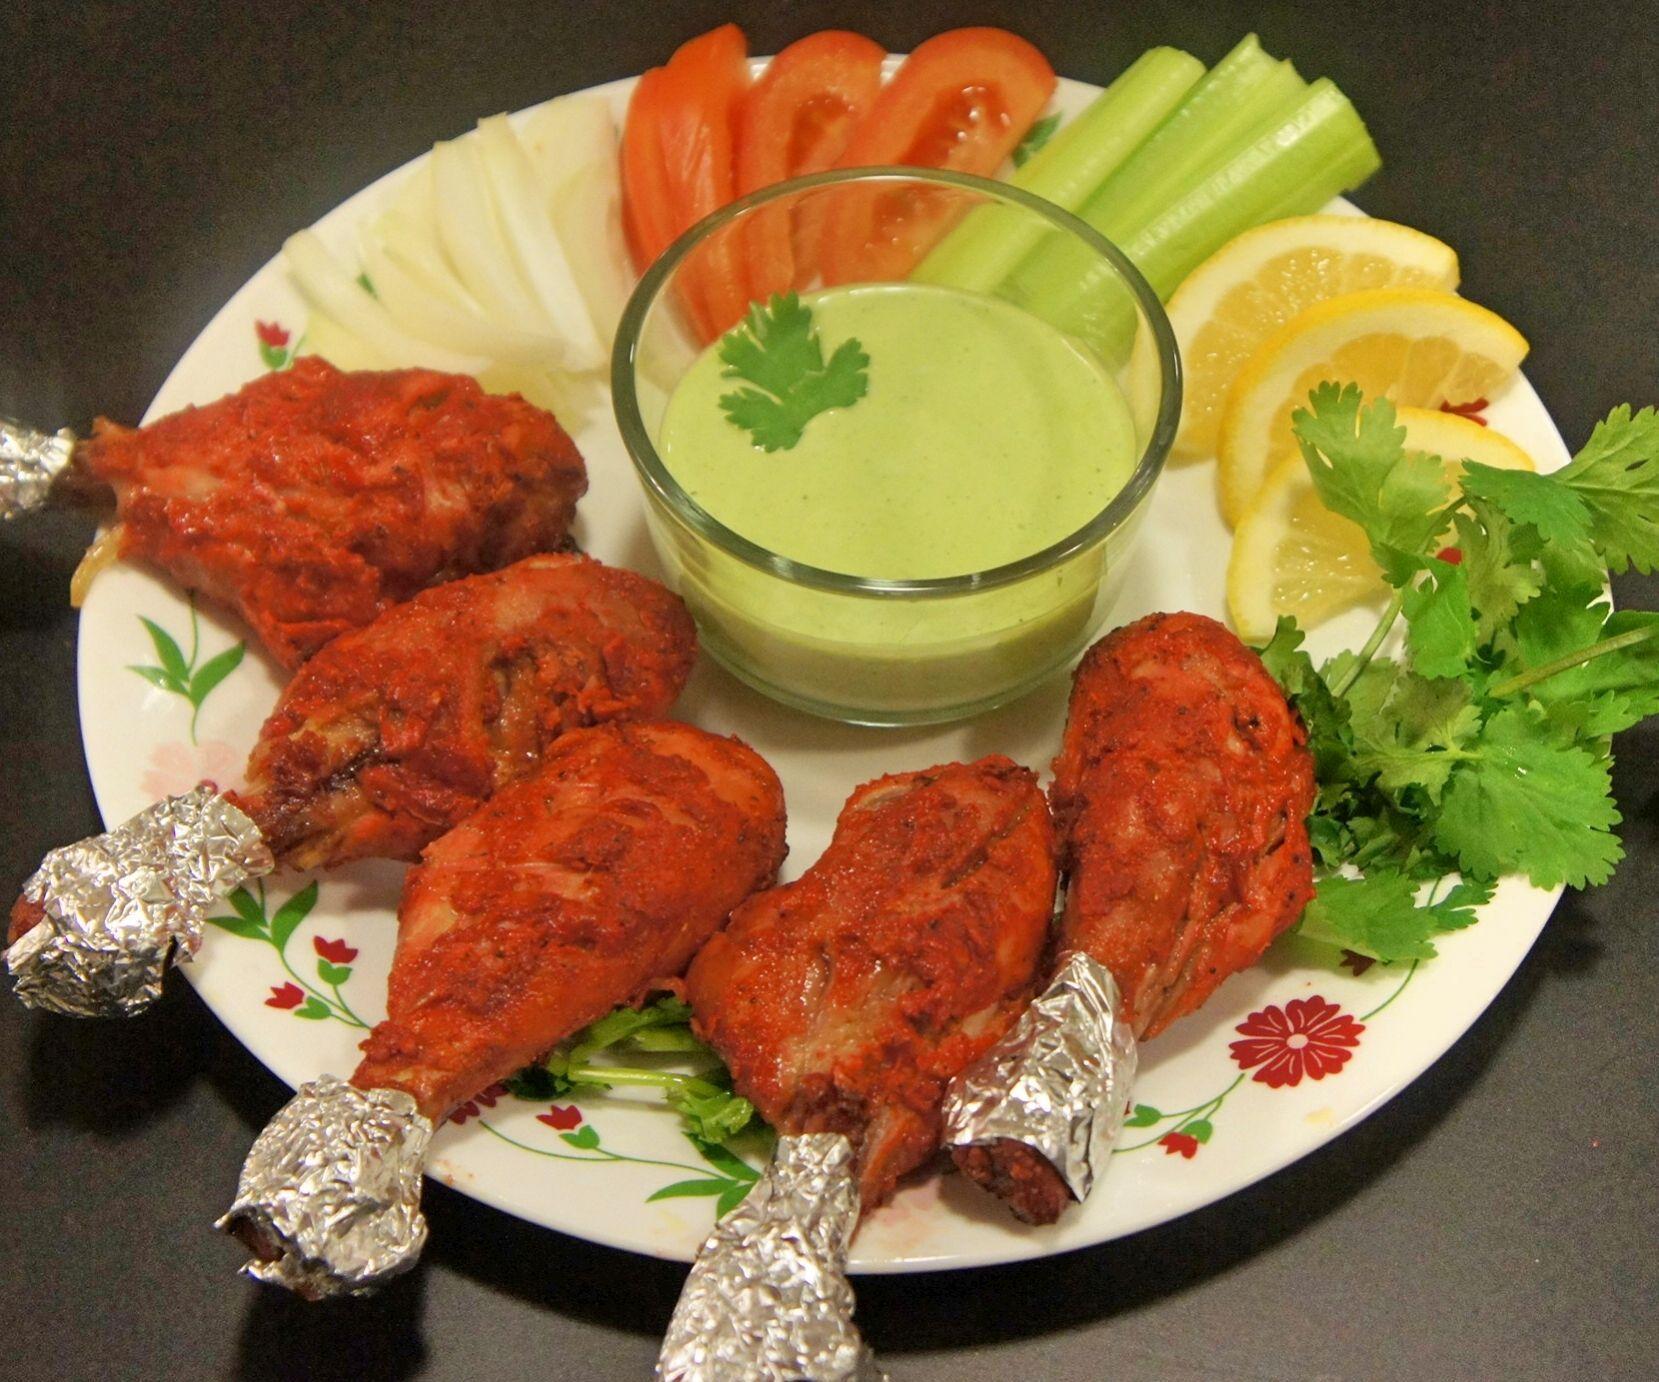 Tandoori Chicken In The Oven With Coriander Yogurt Dip